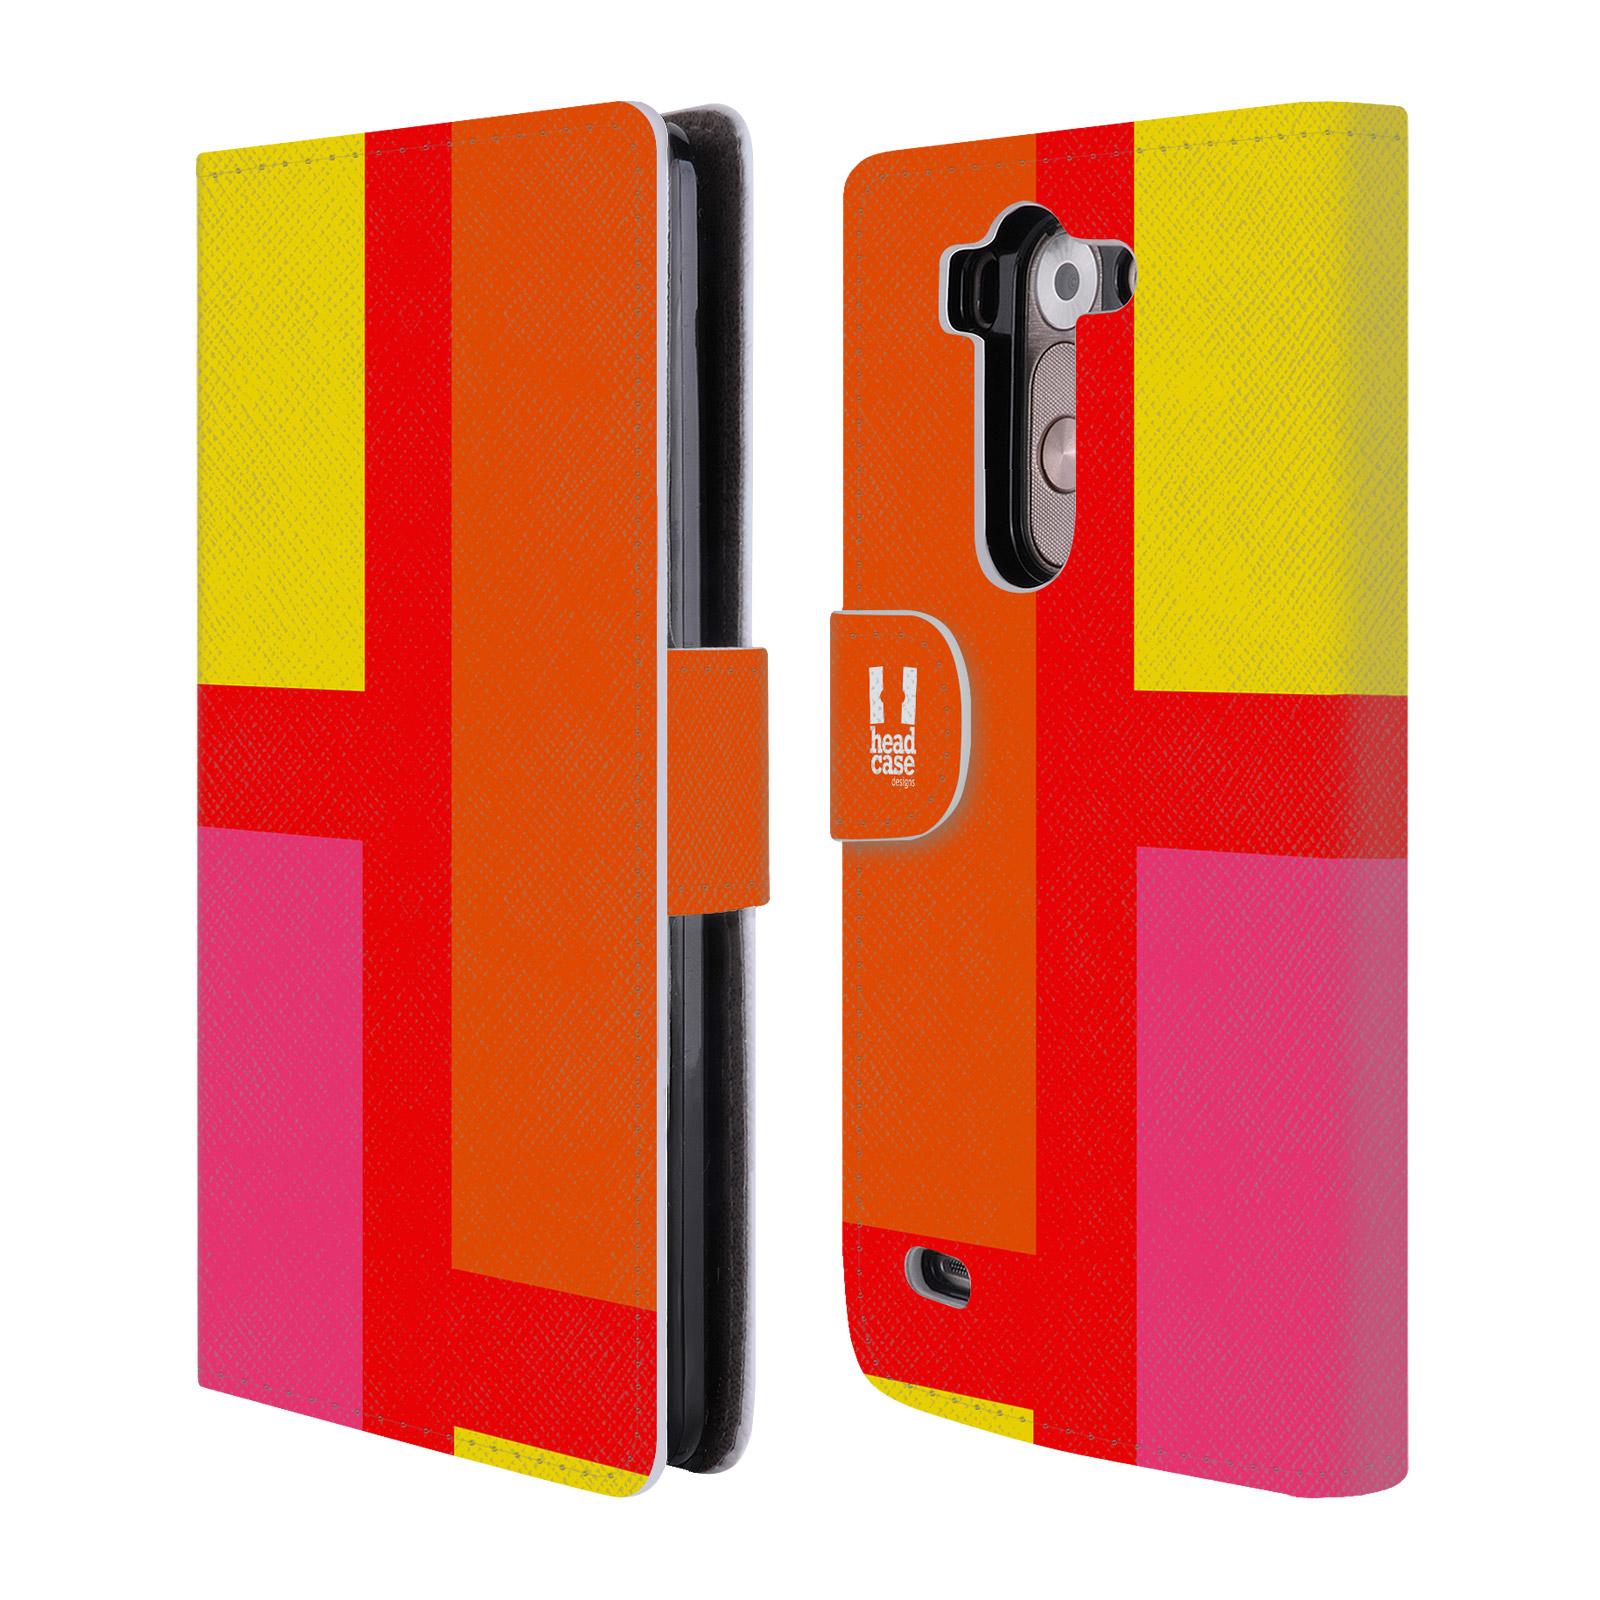 HEAD CASE Flipové pouzdro pro mobil LG G3s barevné tvary oranžová ulice